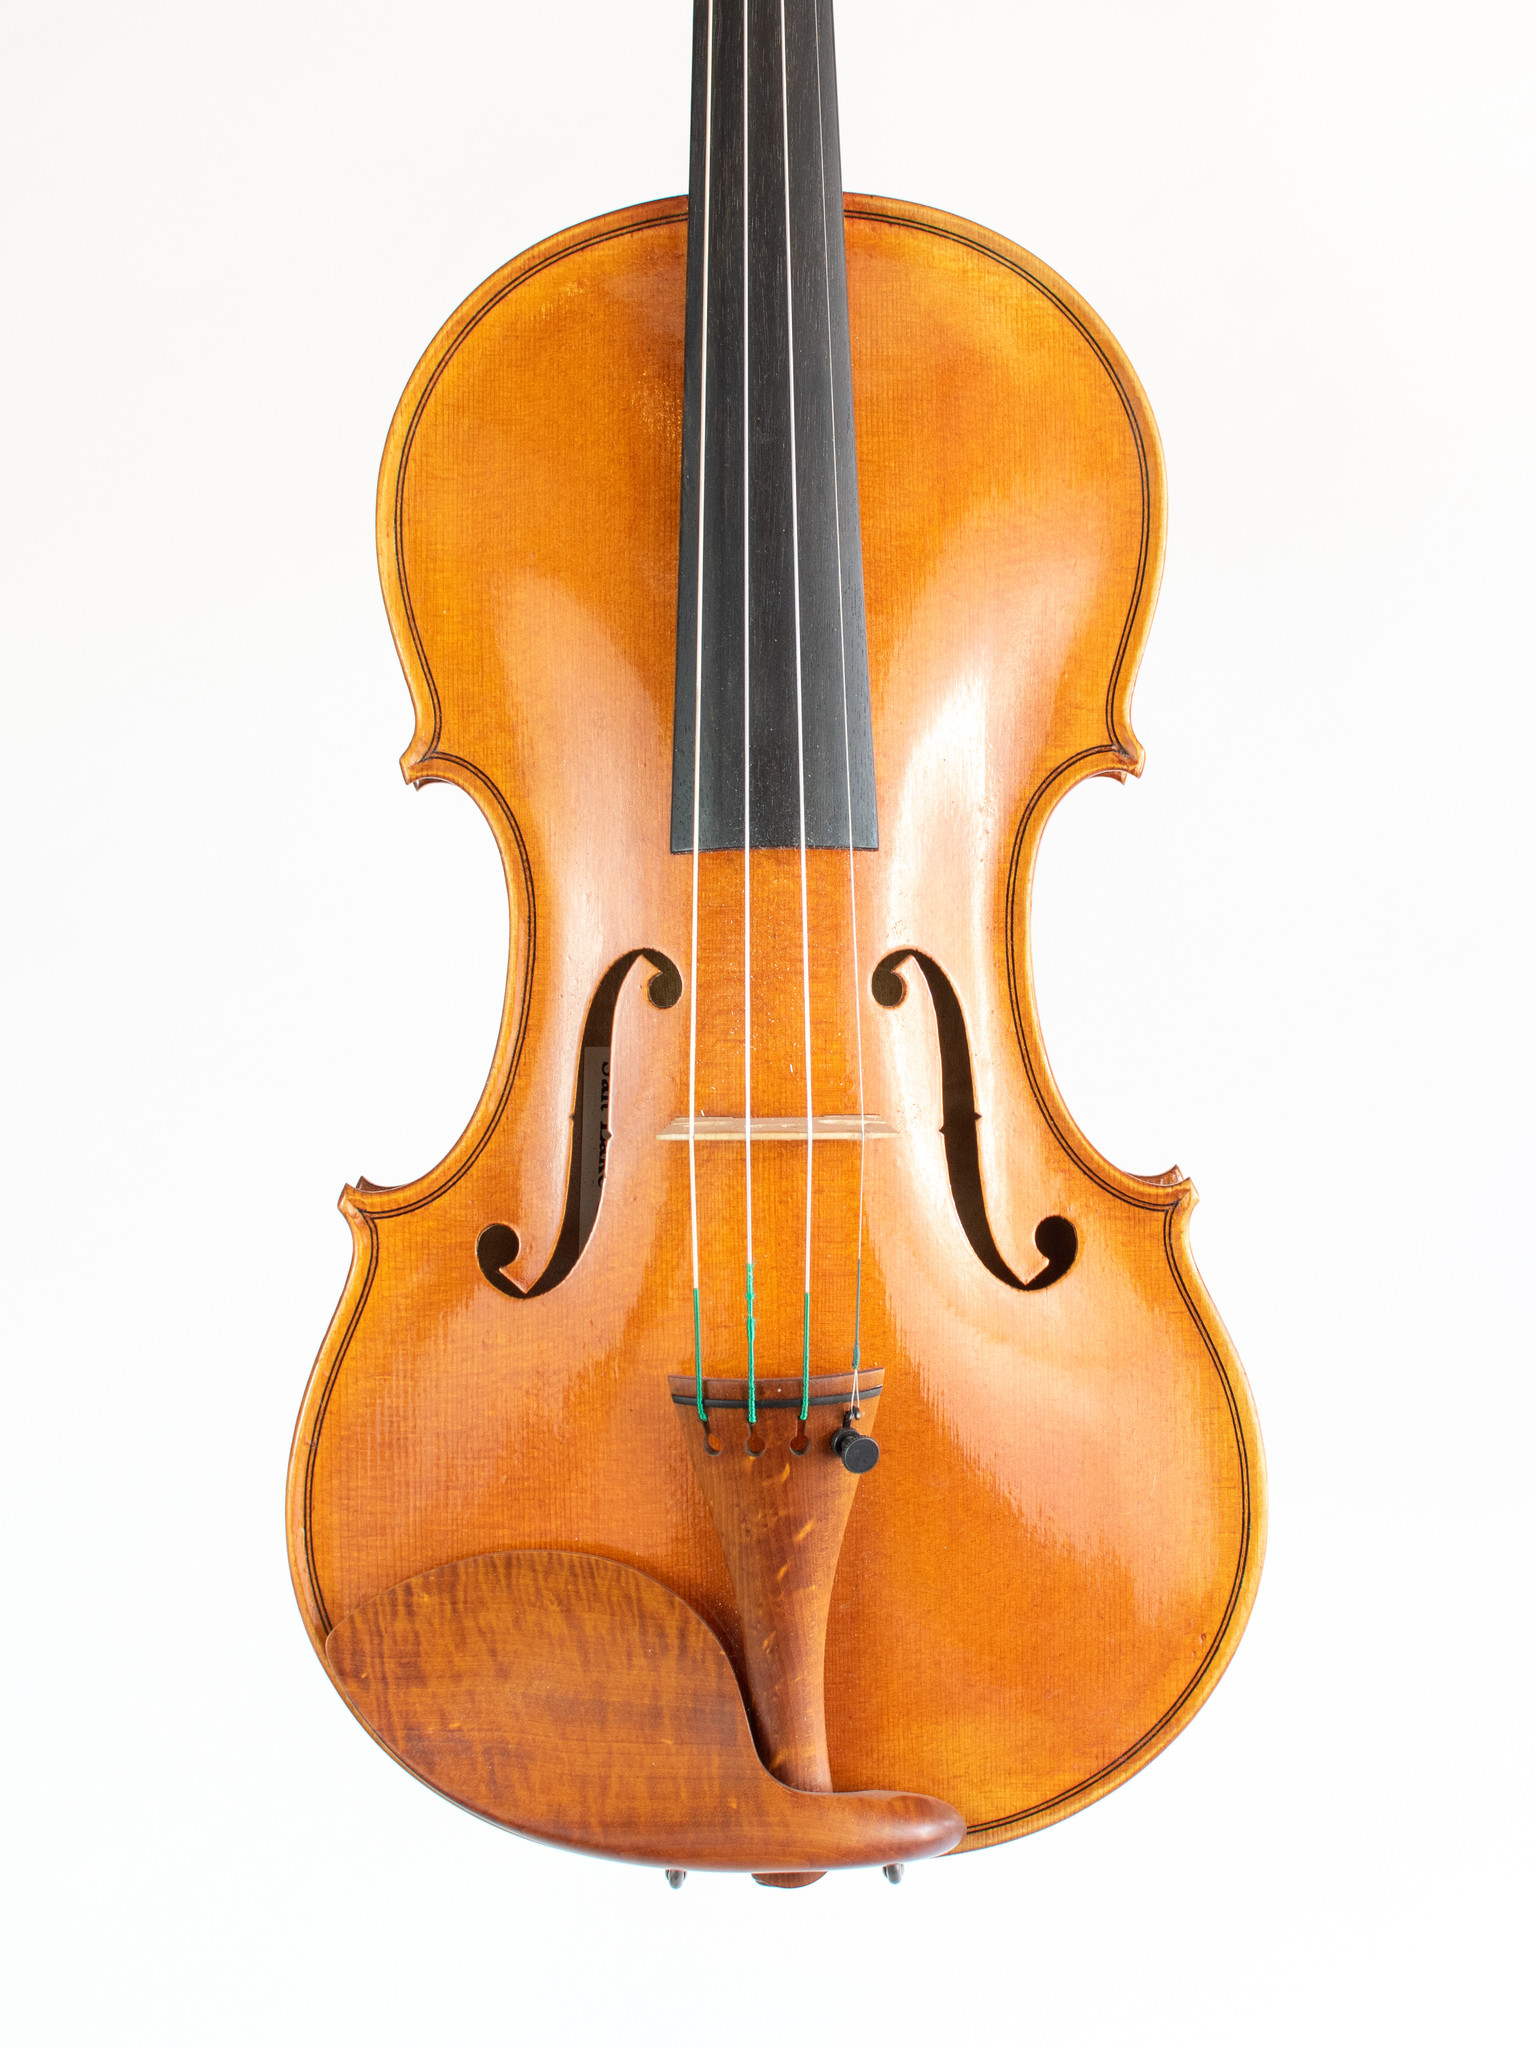 Jordan Hess violin, Guarneri model, 1-piece back, 2020, Salt Lake City